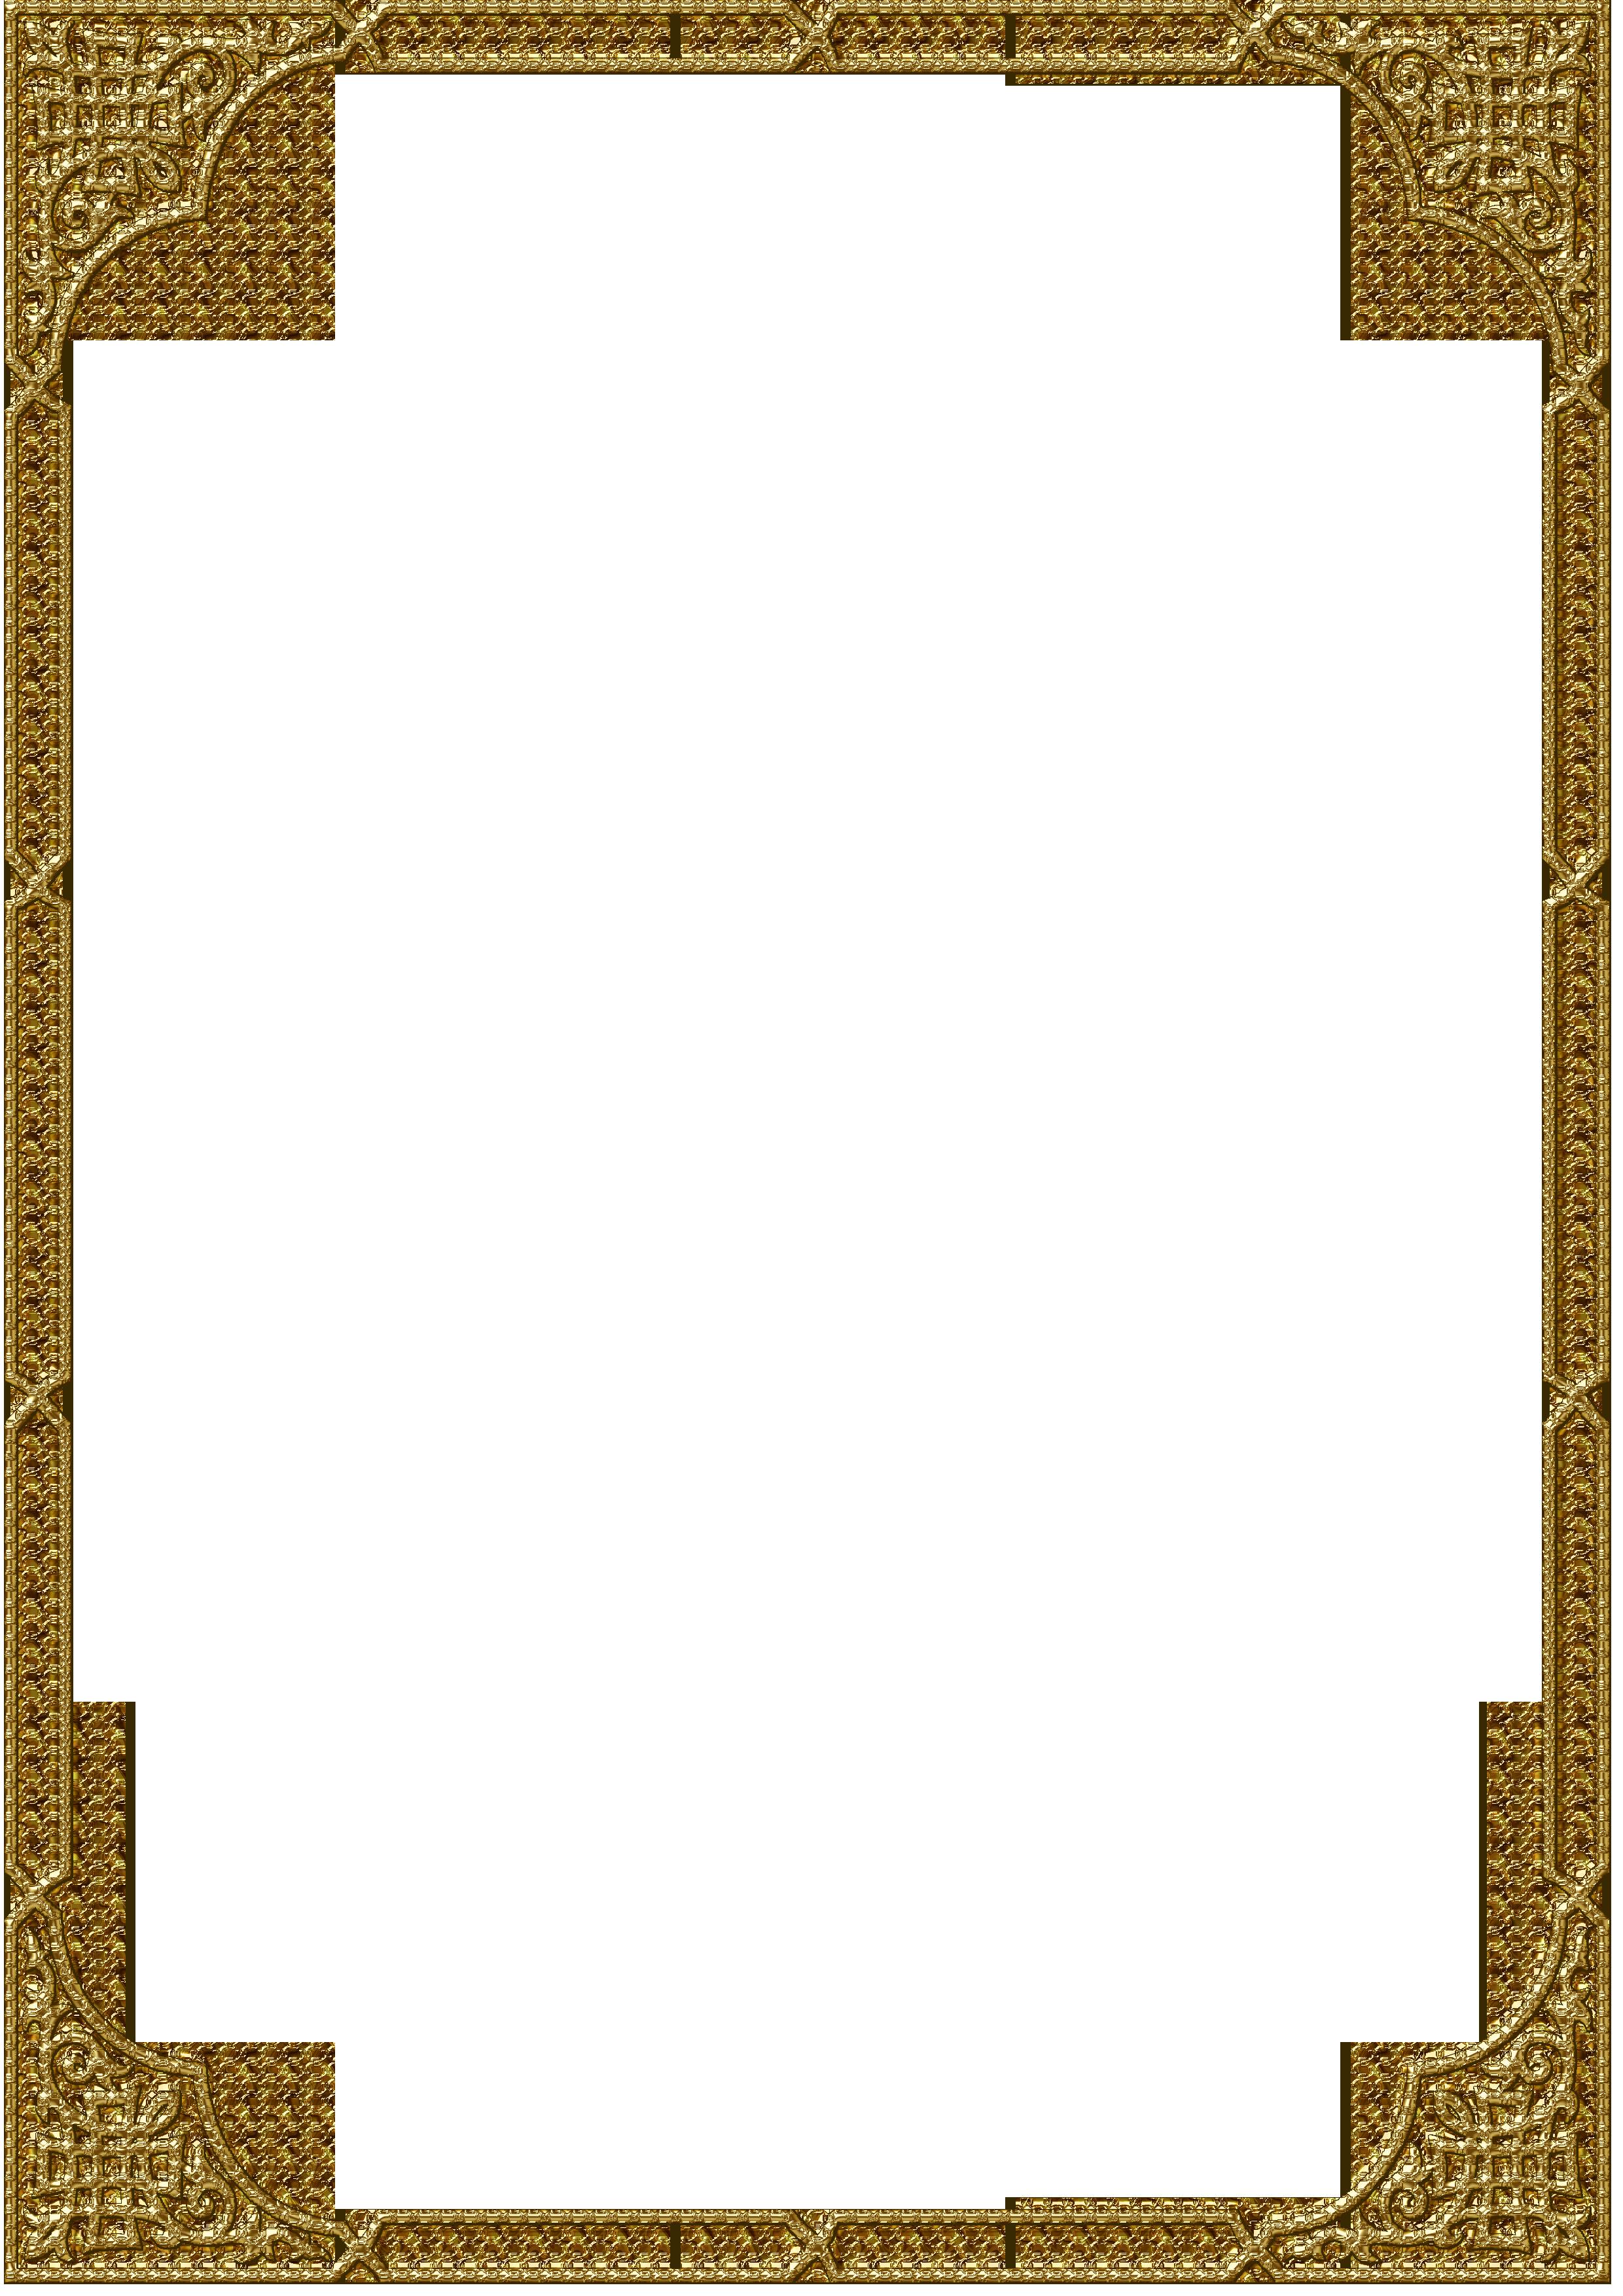 картинка на рамку